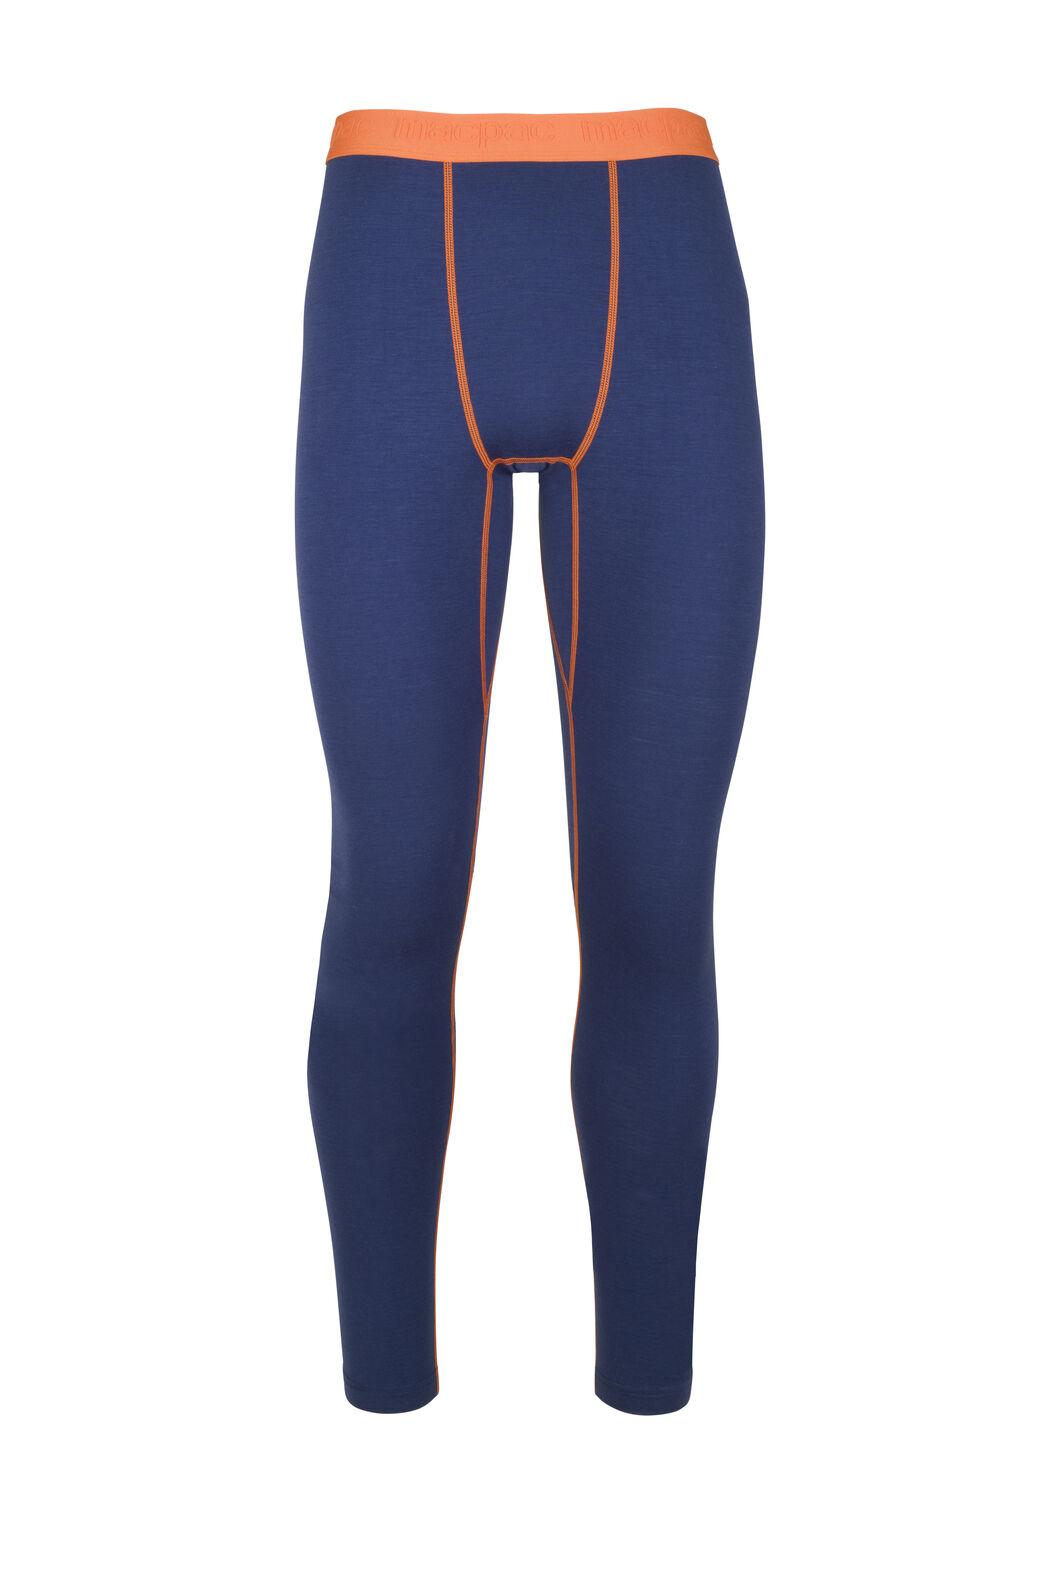 Macpac 180 Merino Long Johns — Men's, Blue Depths/Burnt Orange, hi-res